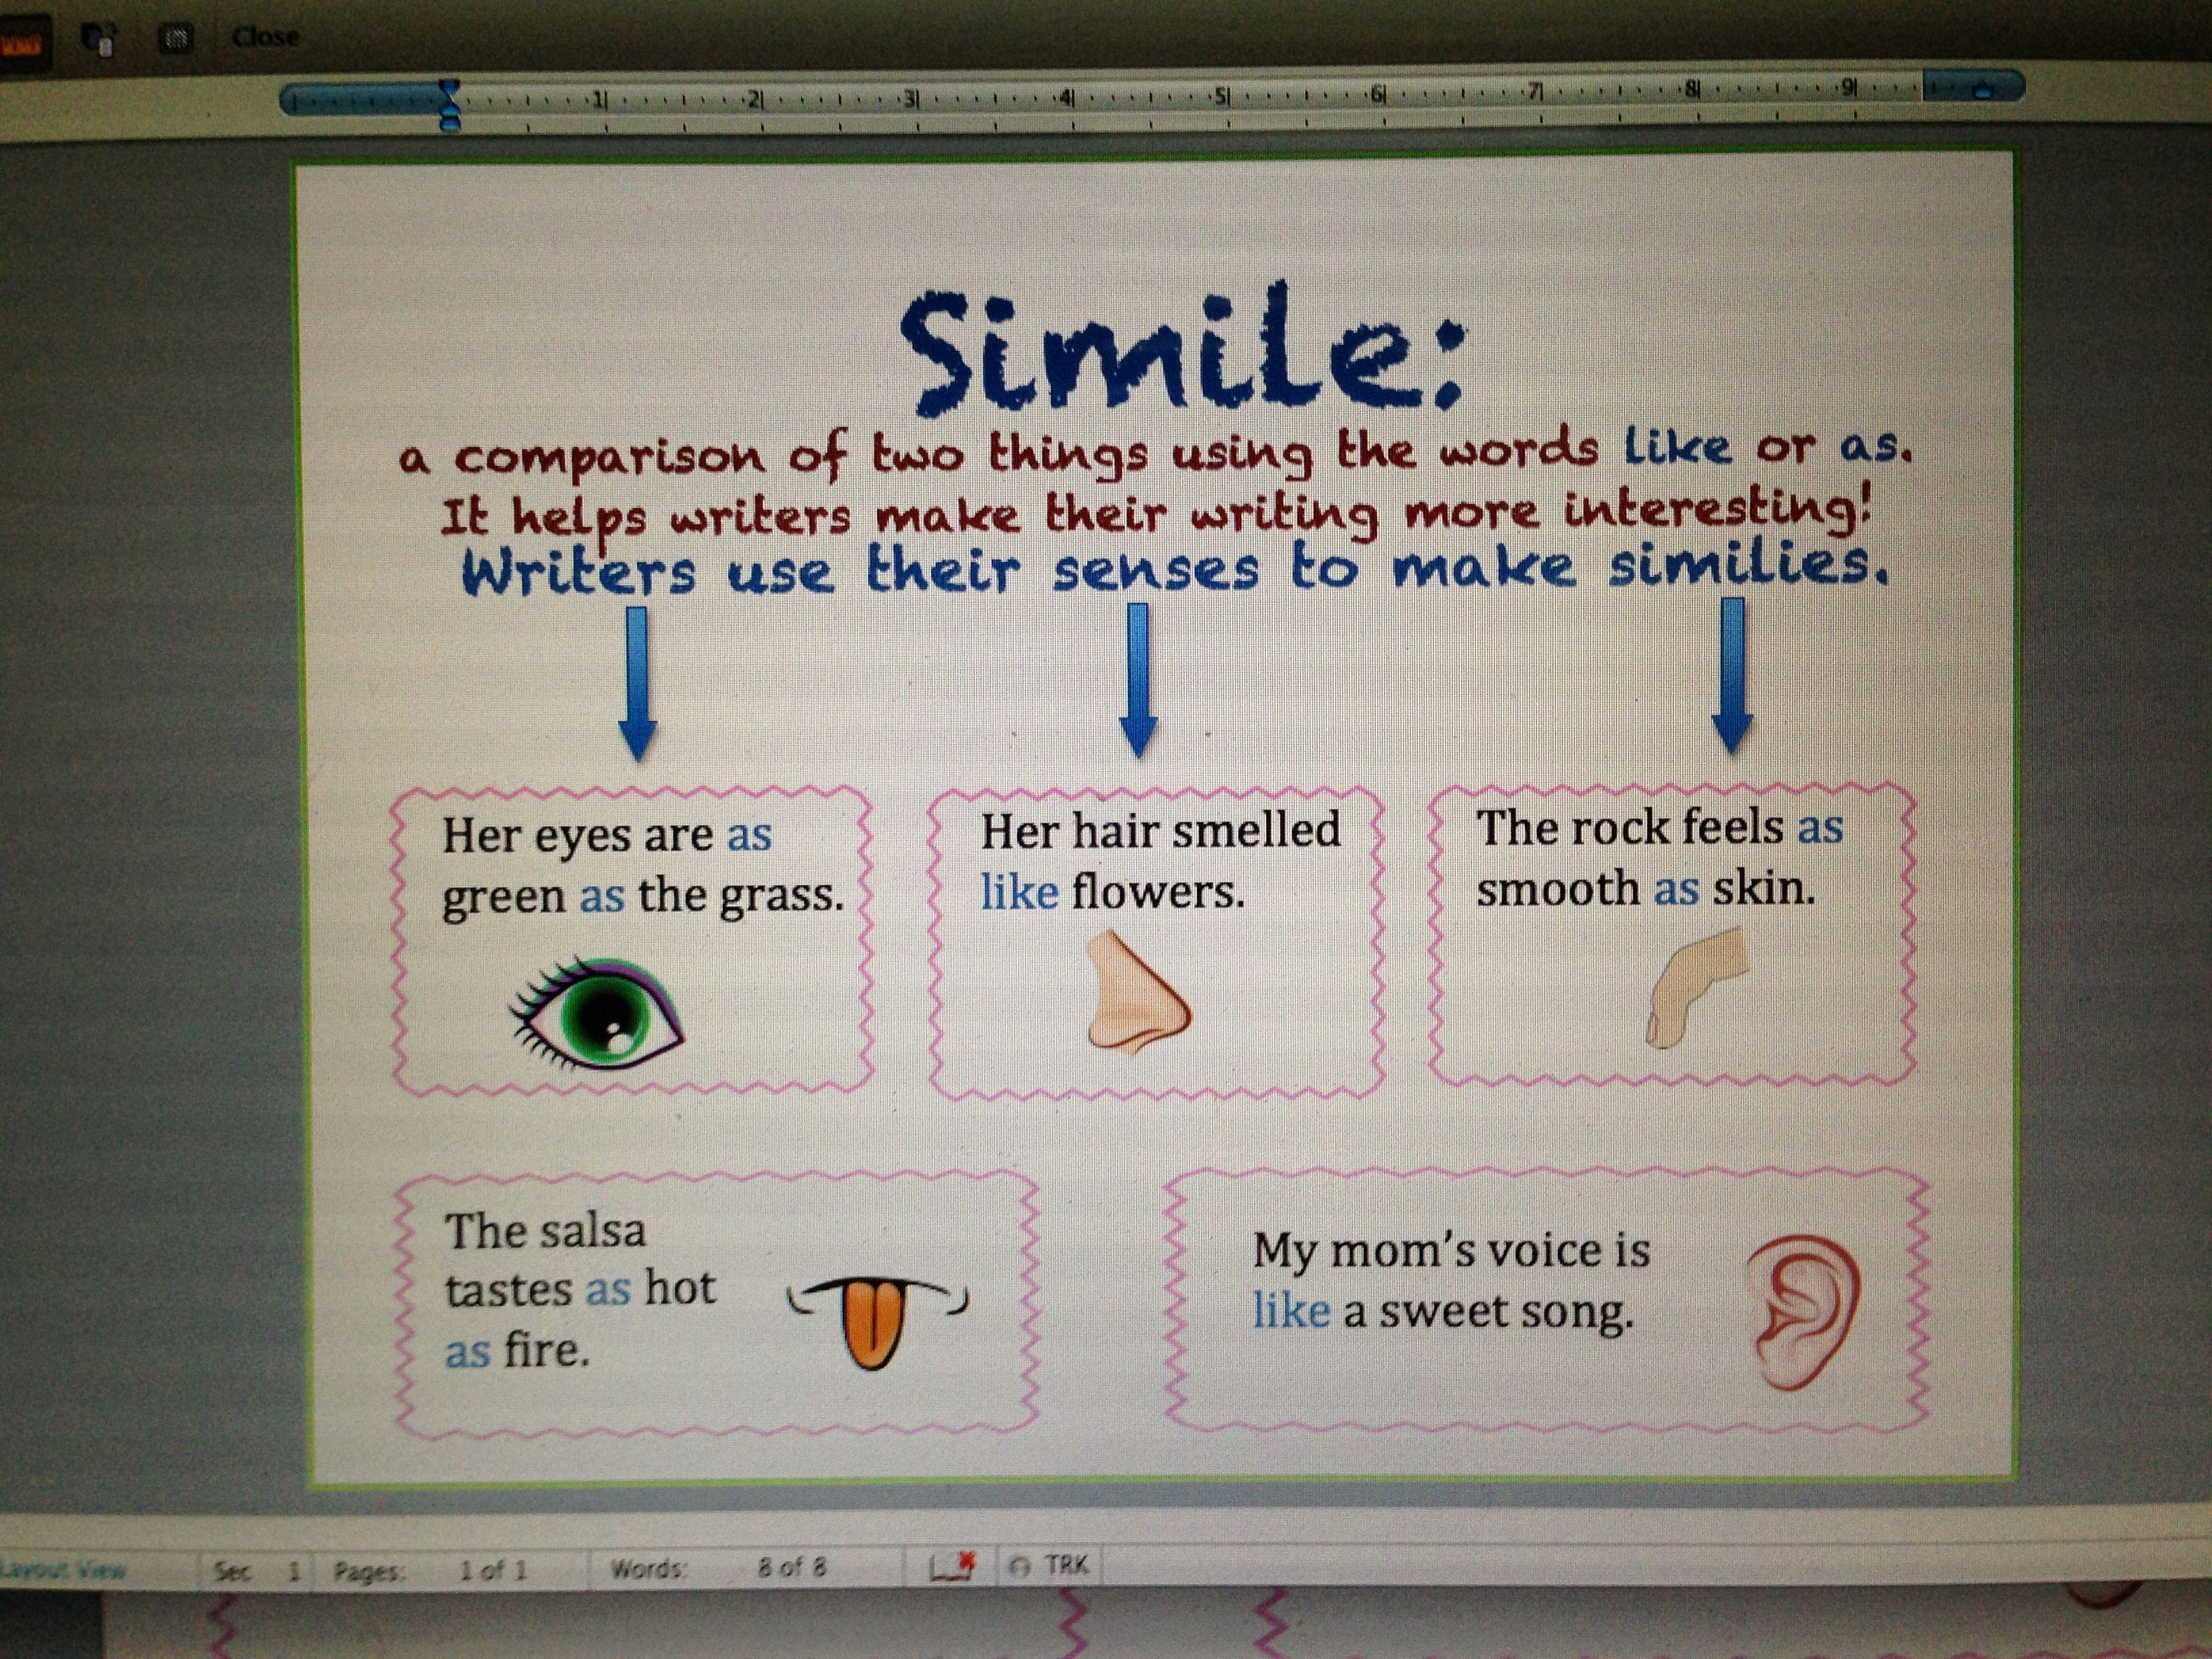 Simile Poster Uses Senses To Explain How Writers Make